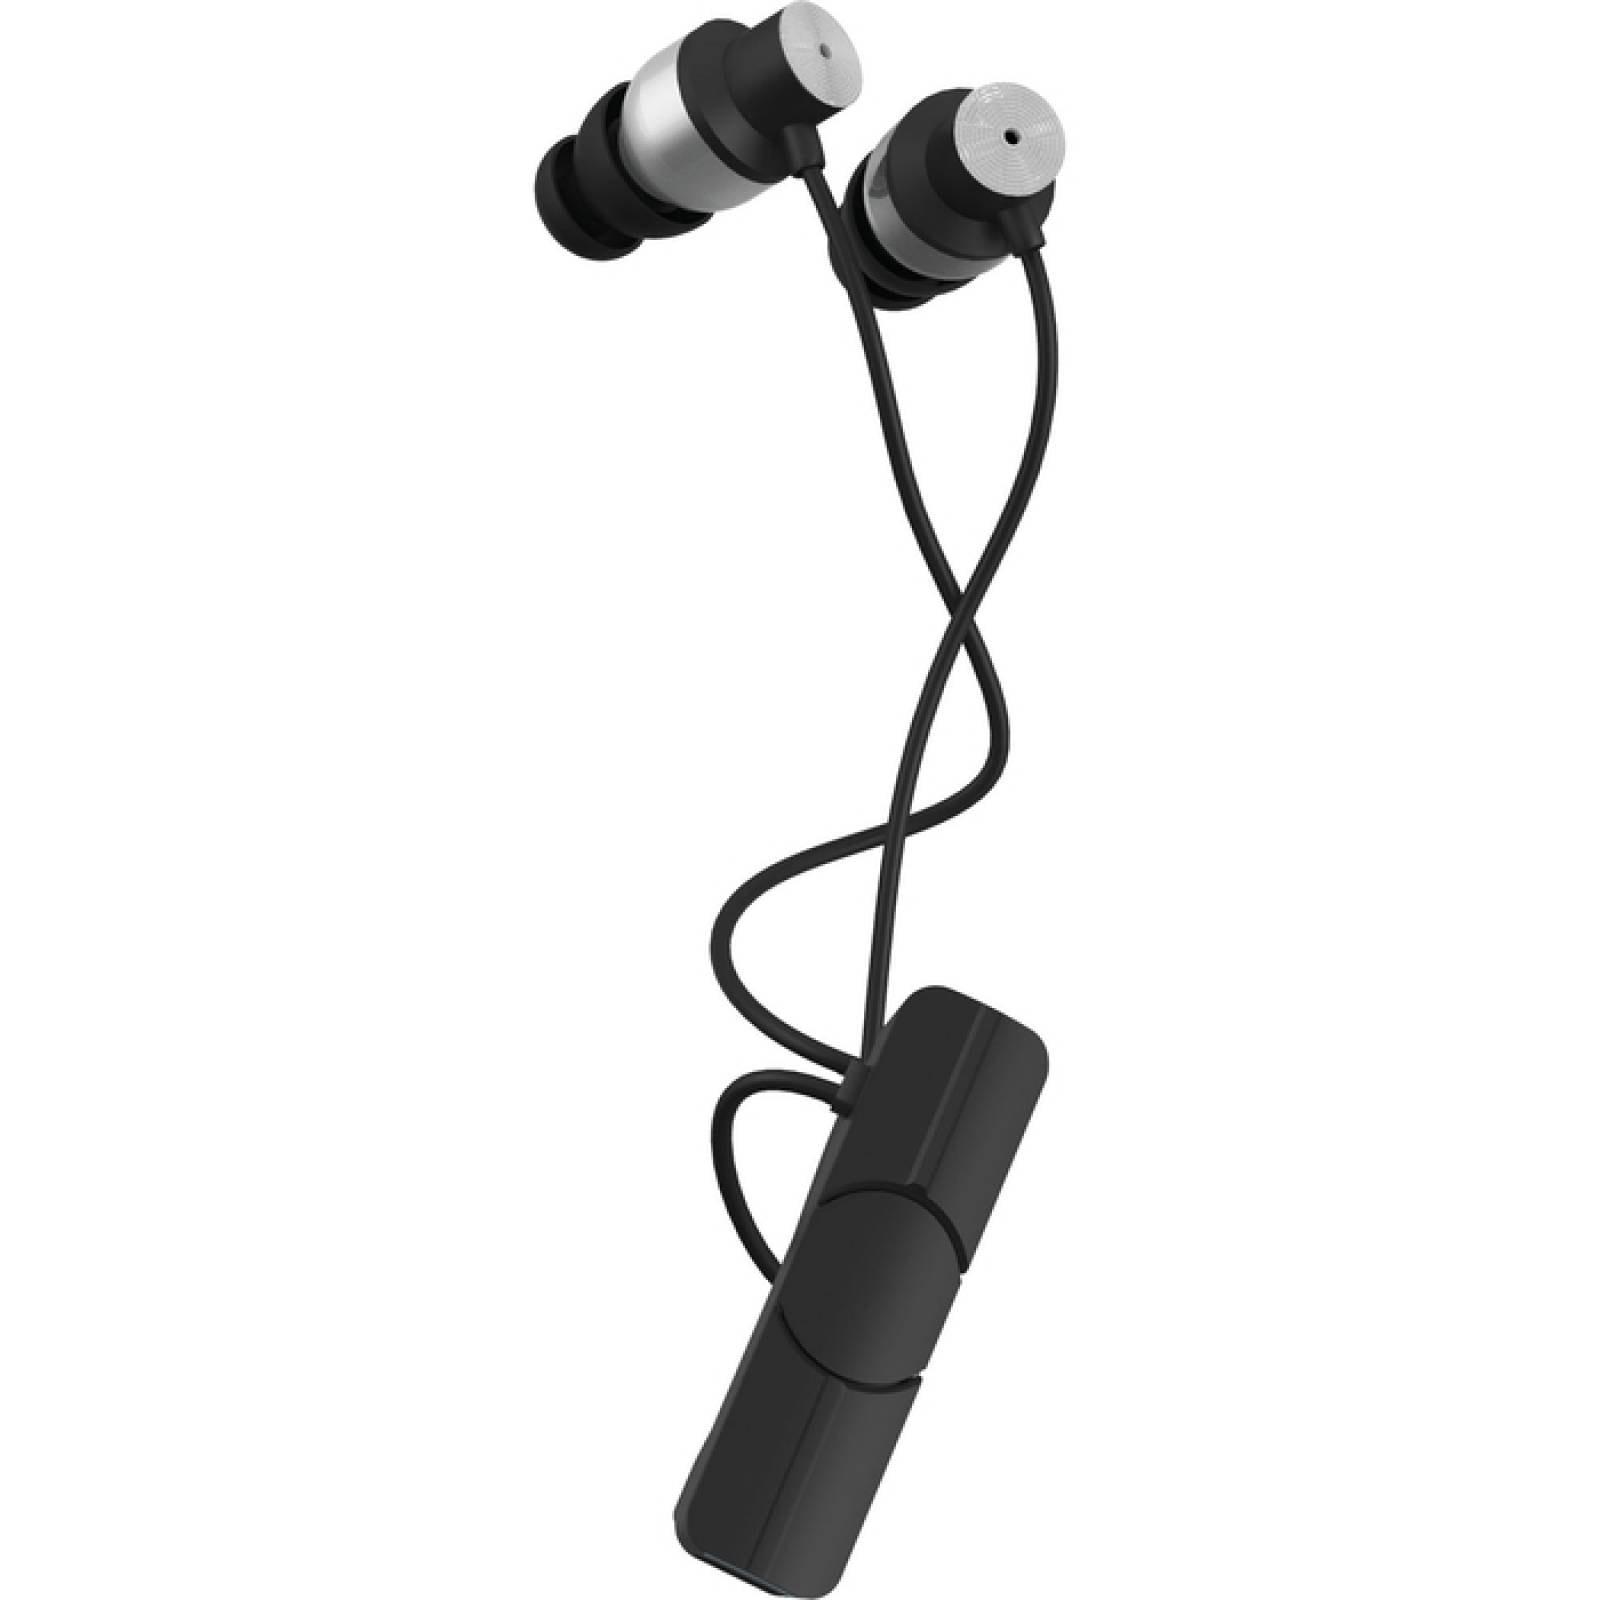 Auriculares inalmbricos de audio premium ifrogz Impulse Wireless